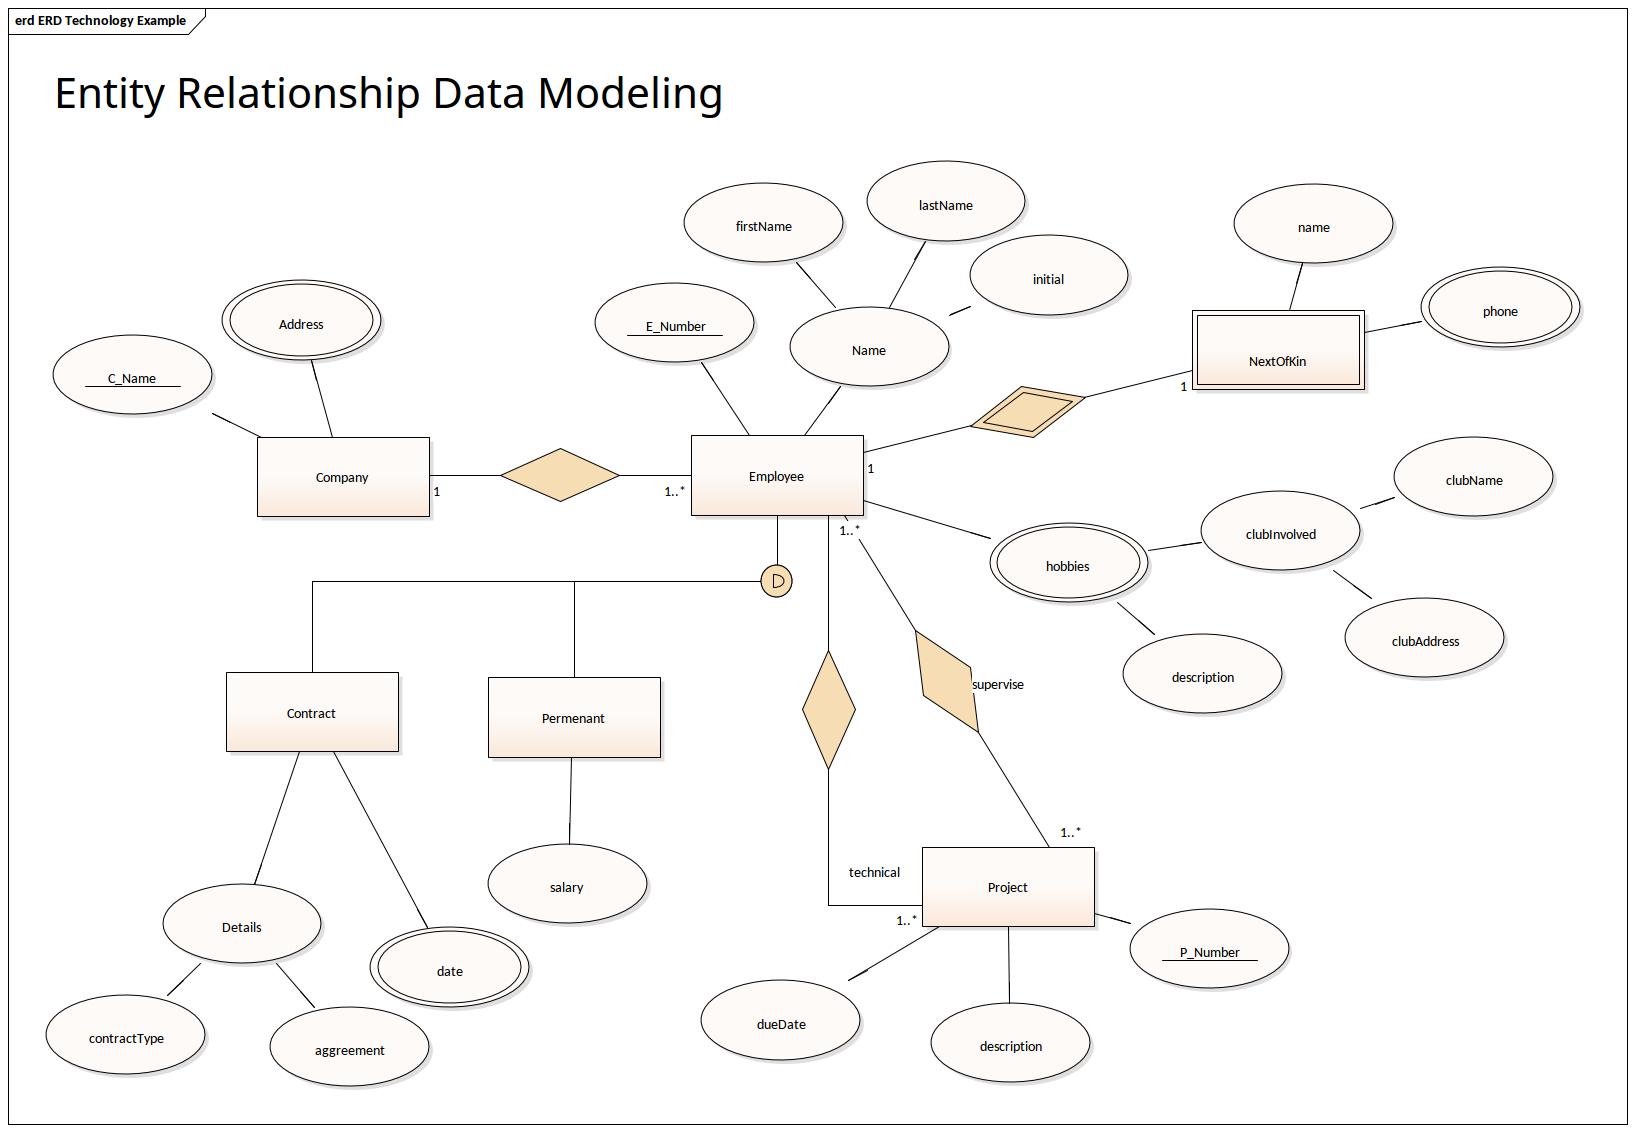 Entity Relationship Data Modeling   Enterprise Architect regarding Data Entity Relationship Diagram